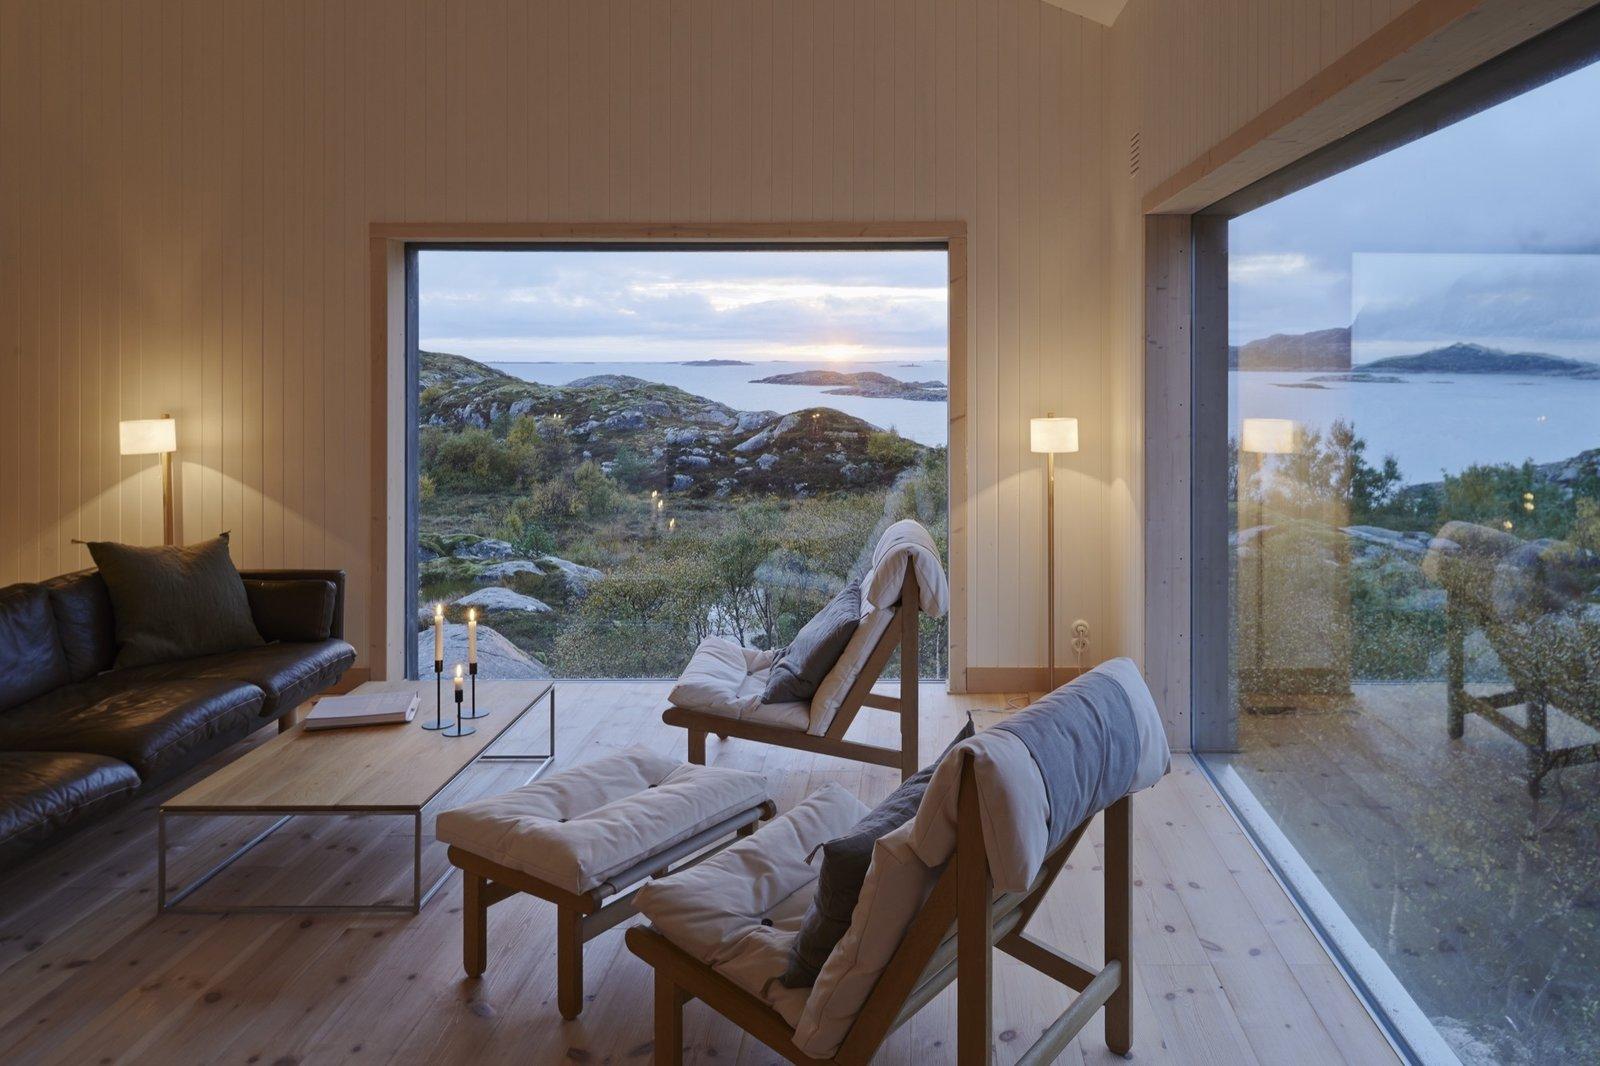 Living Room, Coffee Tables, Chair, Light Hardwood Floor, and Sofa Vega Norge, Erik Kolman Janush  Photo 6 of 14 in Naked Naust